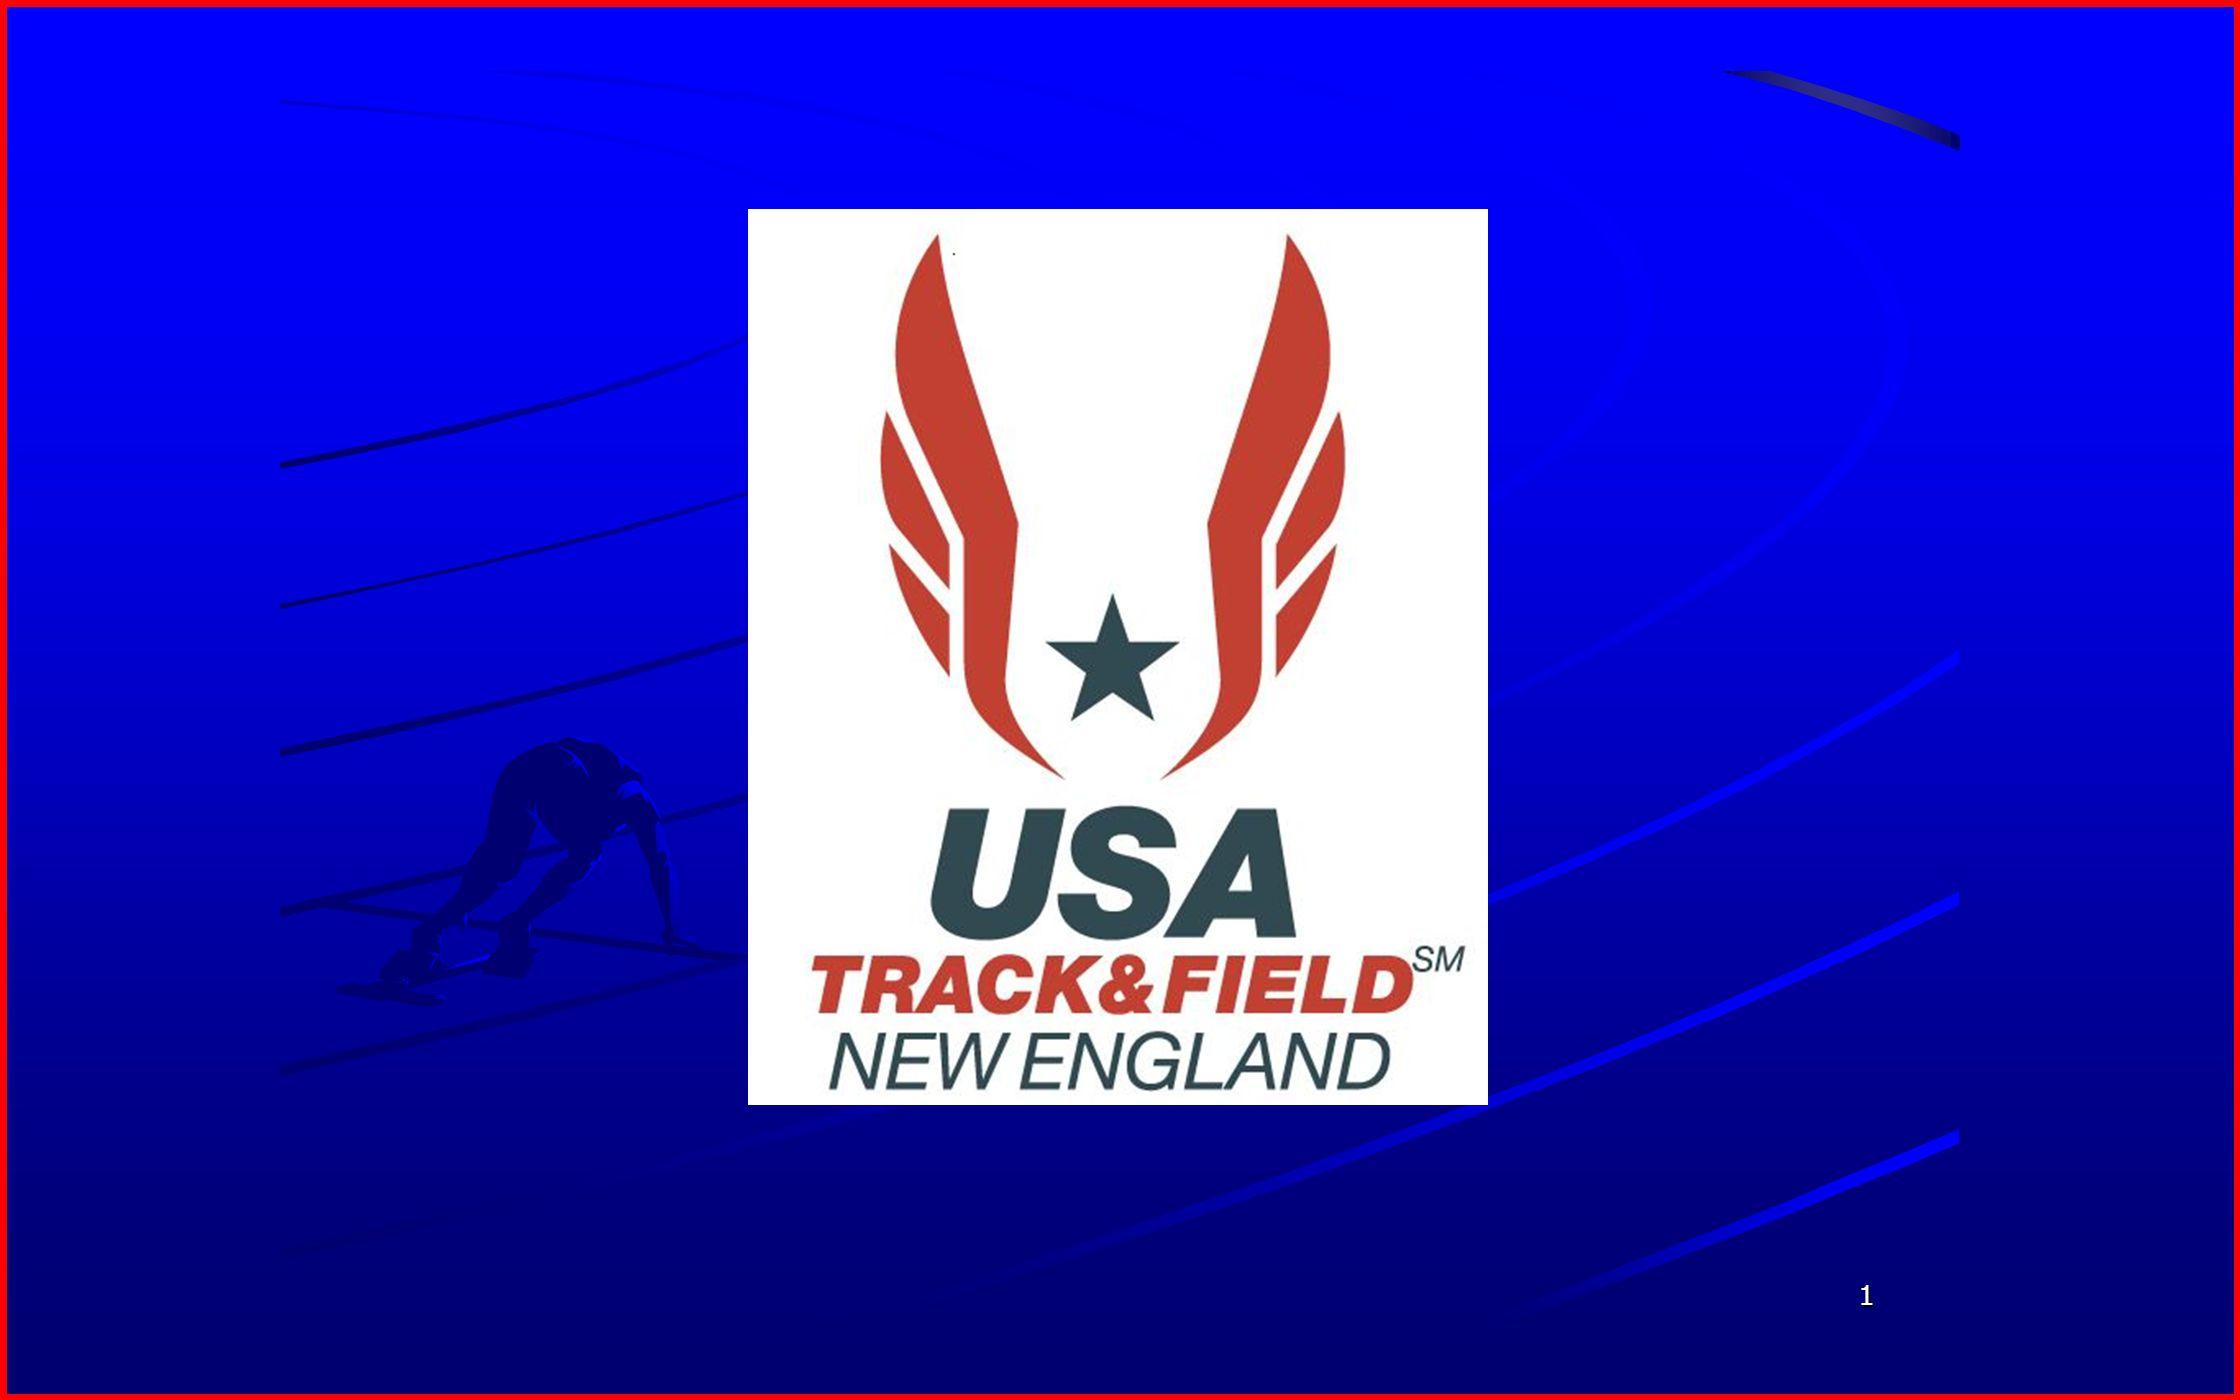 2 BID APPLICATION USA TRACK & FIELD - NEW ENGLAND BID APPLICATION USA TRACK & FIELD - NEW ENGLAND NATIONAL MASTERS INDOOR TRACK & FIELD CHAMPIONSHIPS NATIONAL MASTERS INDOOR TRACK & FIELD CHAMPIONSHIPS 2014